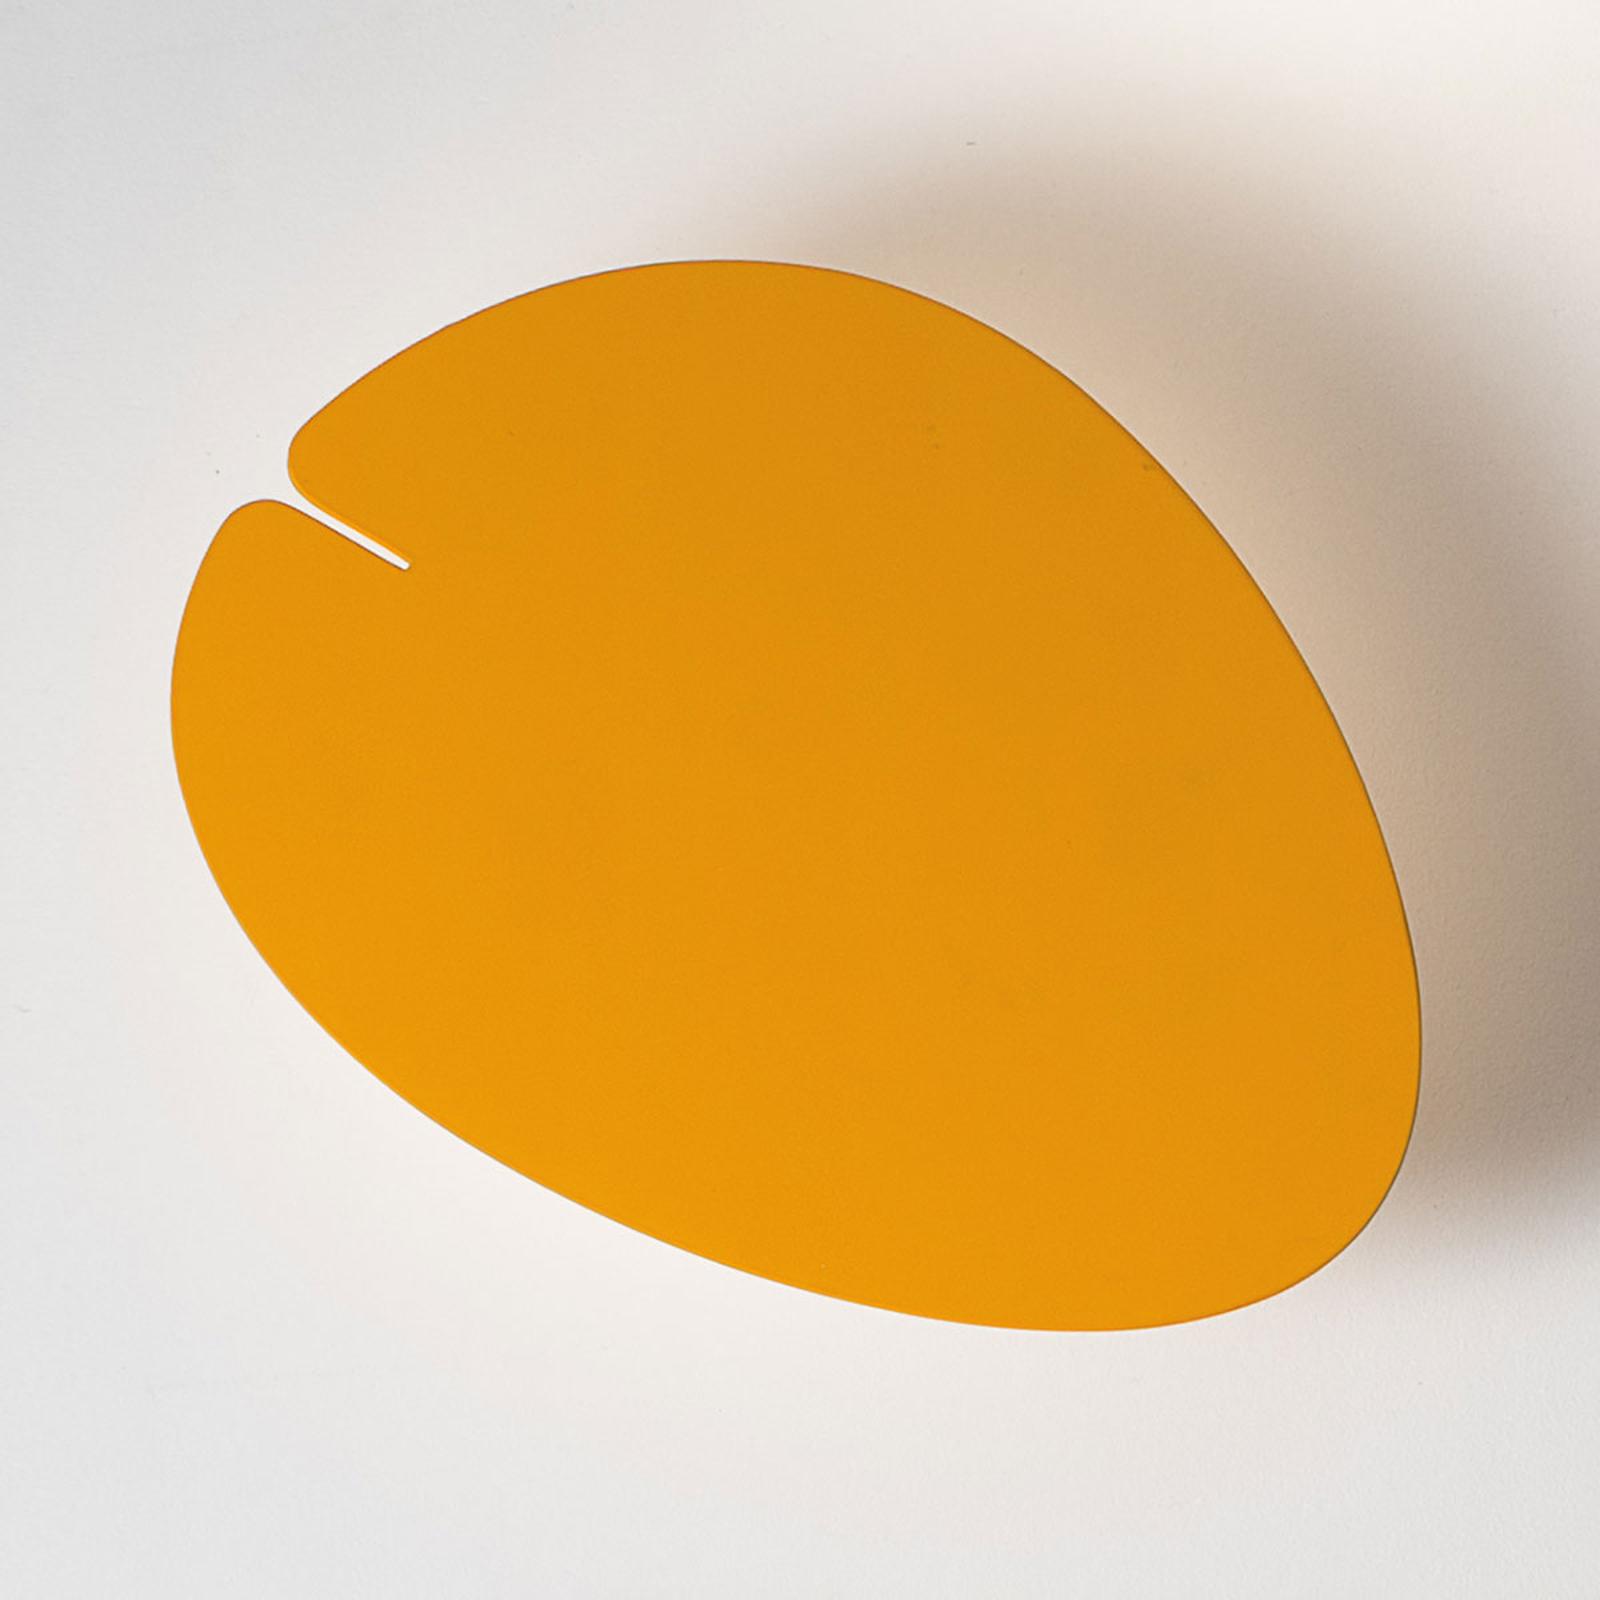 Martinelli Luce Lucciola LED-Wandleuchte in Gelb